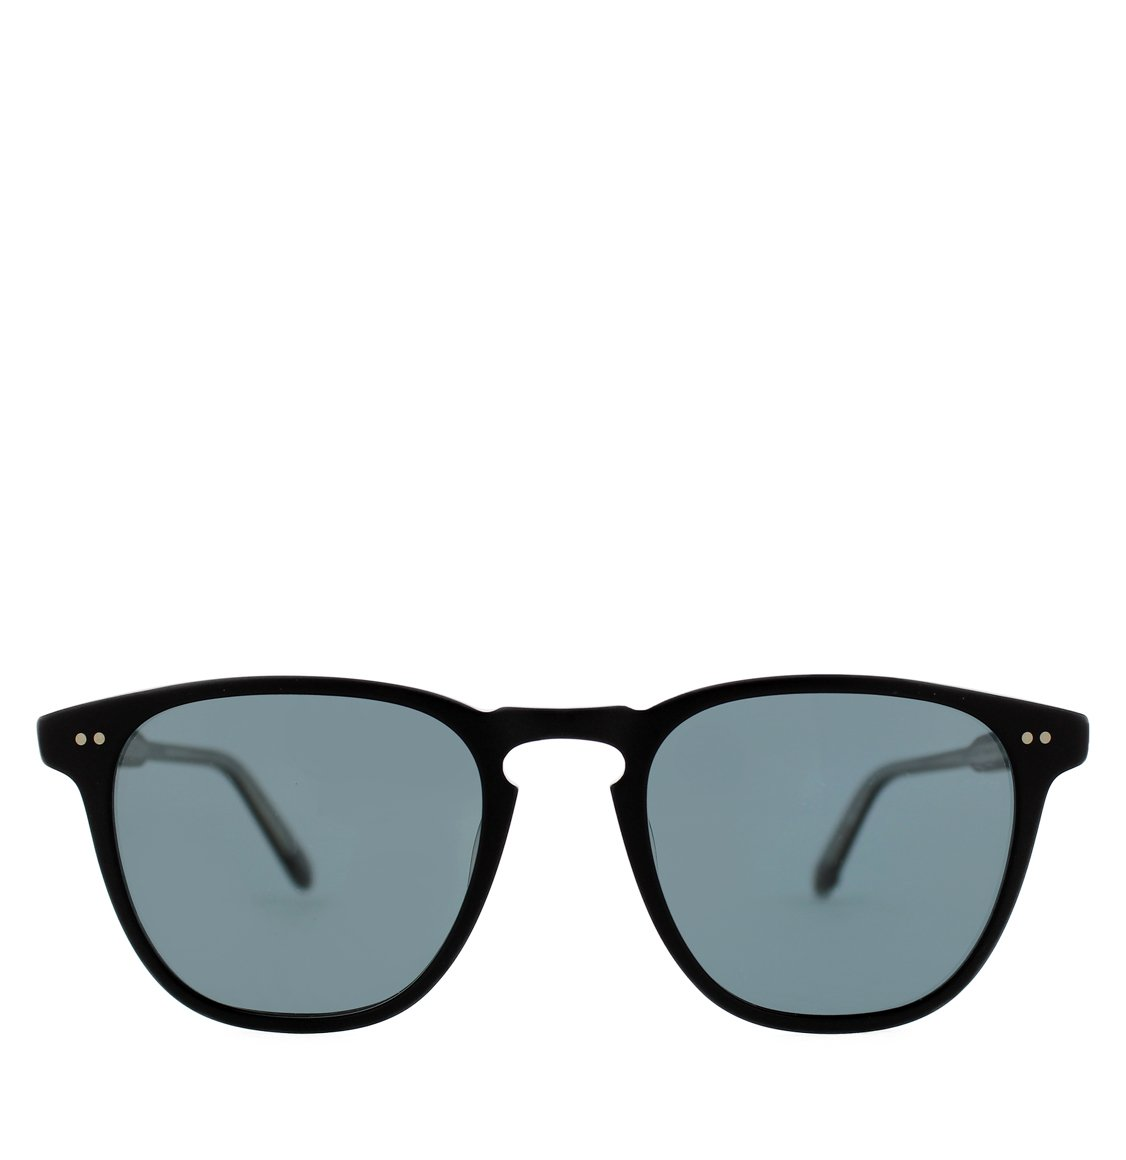 Garrett Leight Square Matt Black Γυαλιά Ηλίου